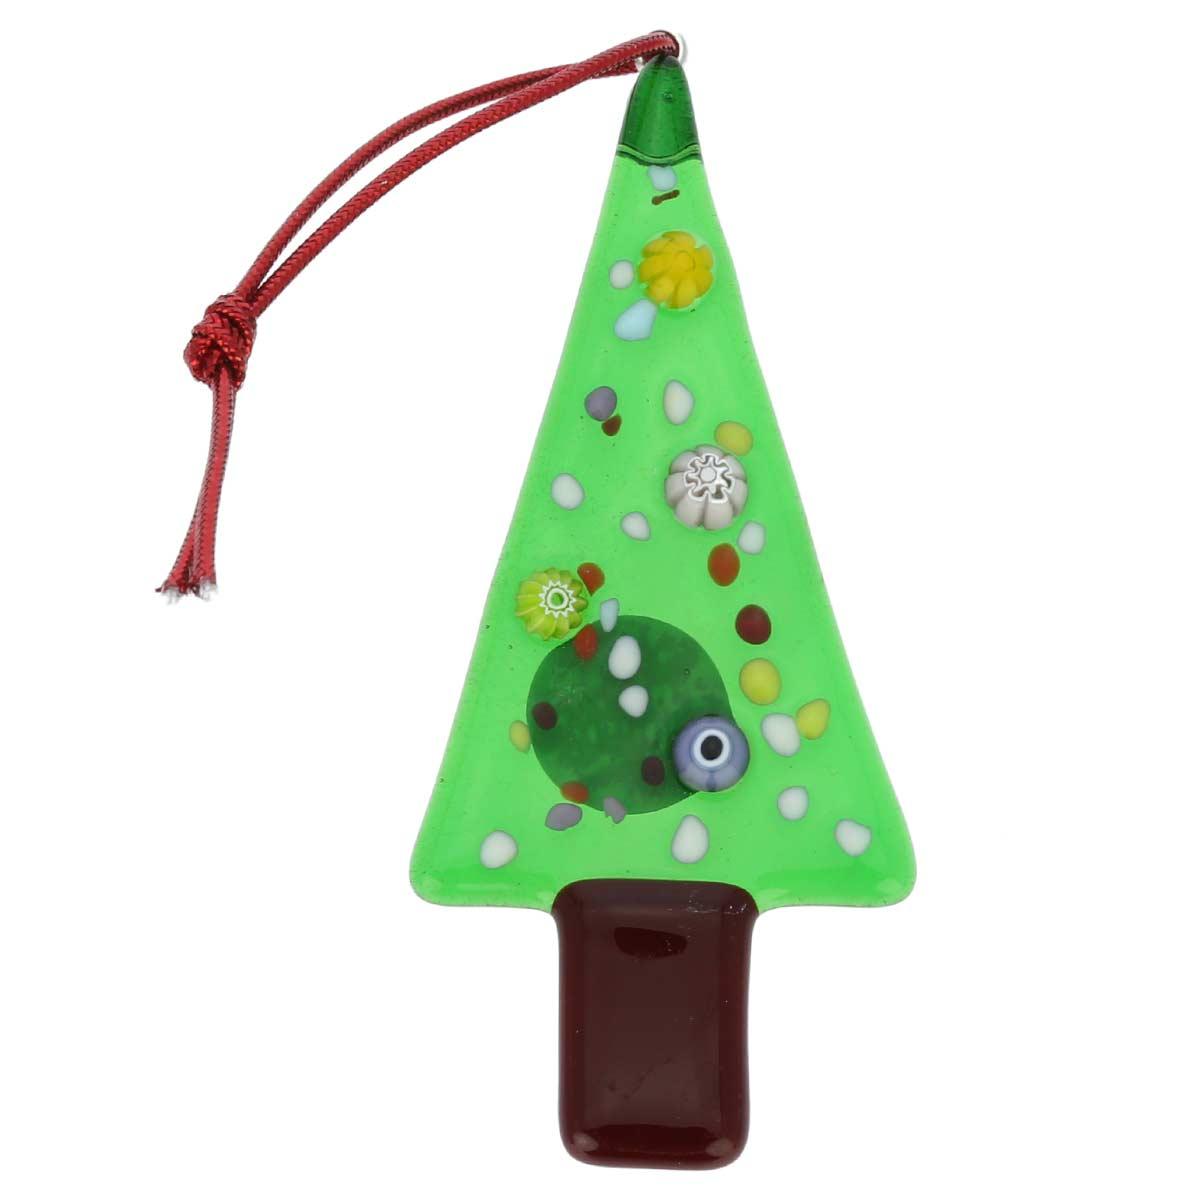 Murano glass christmas tree ornament - Murano glass christmas tree ...